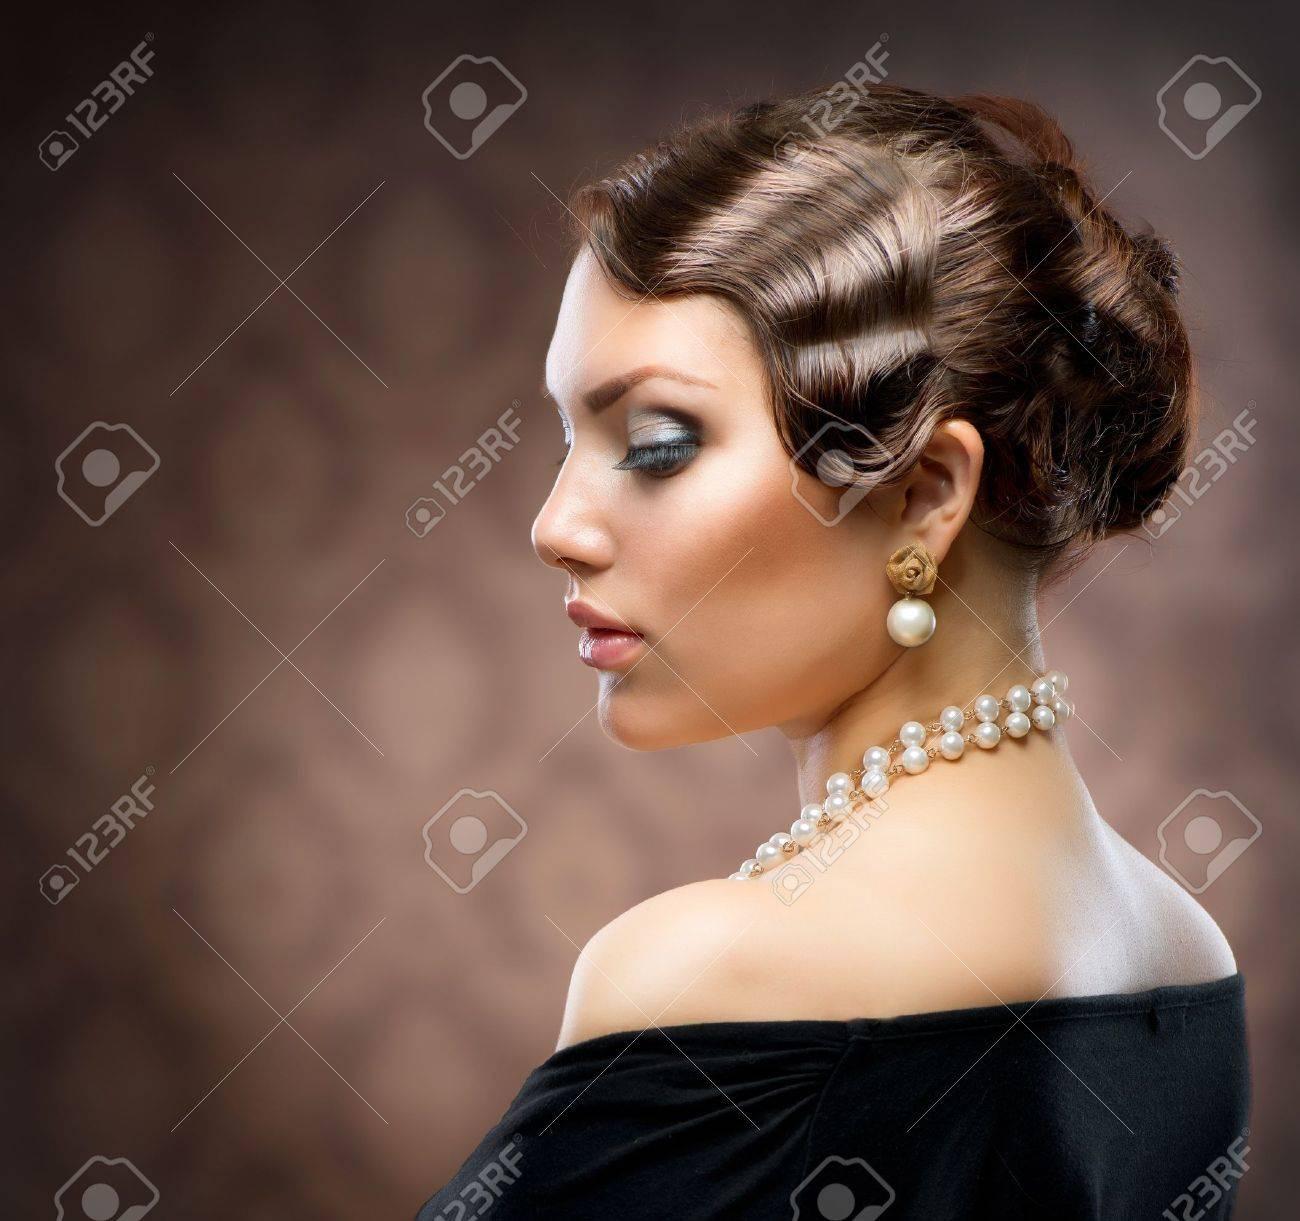 Classical Retro Style Portrait  Romantic Beauty  Vintage Classical Retro Style Portrait  Romantic Beauty  Vintage Stock Photo - 14193501